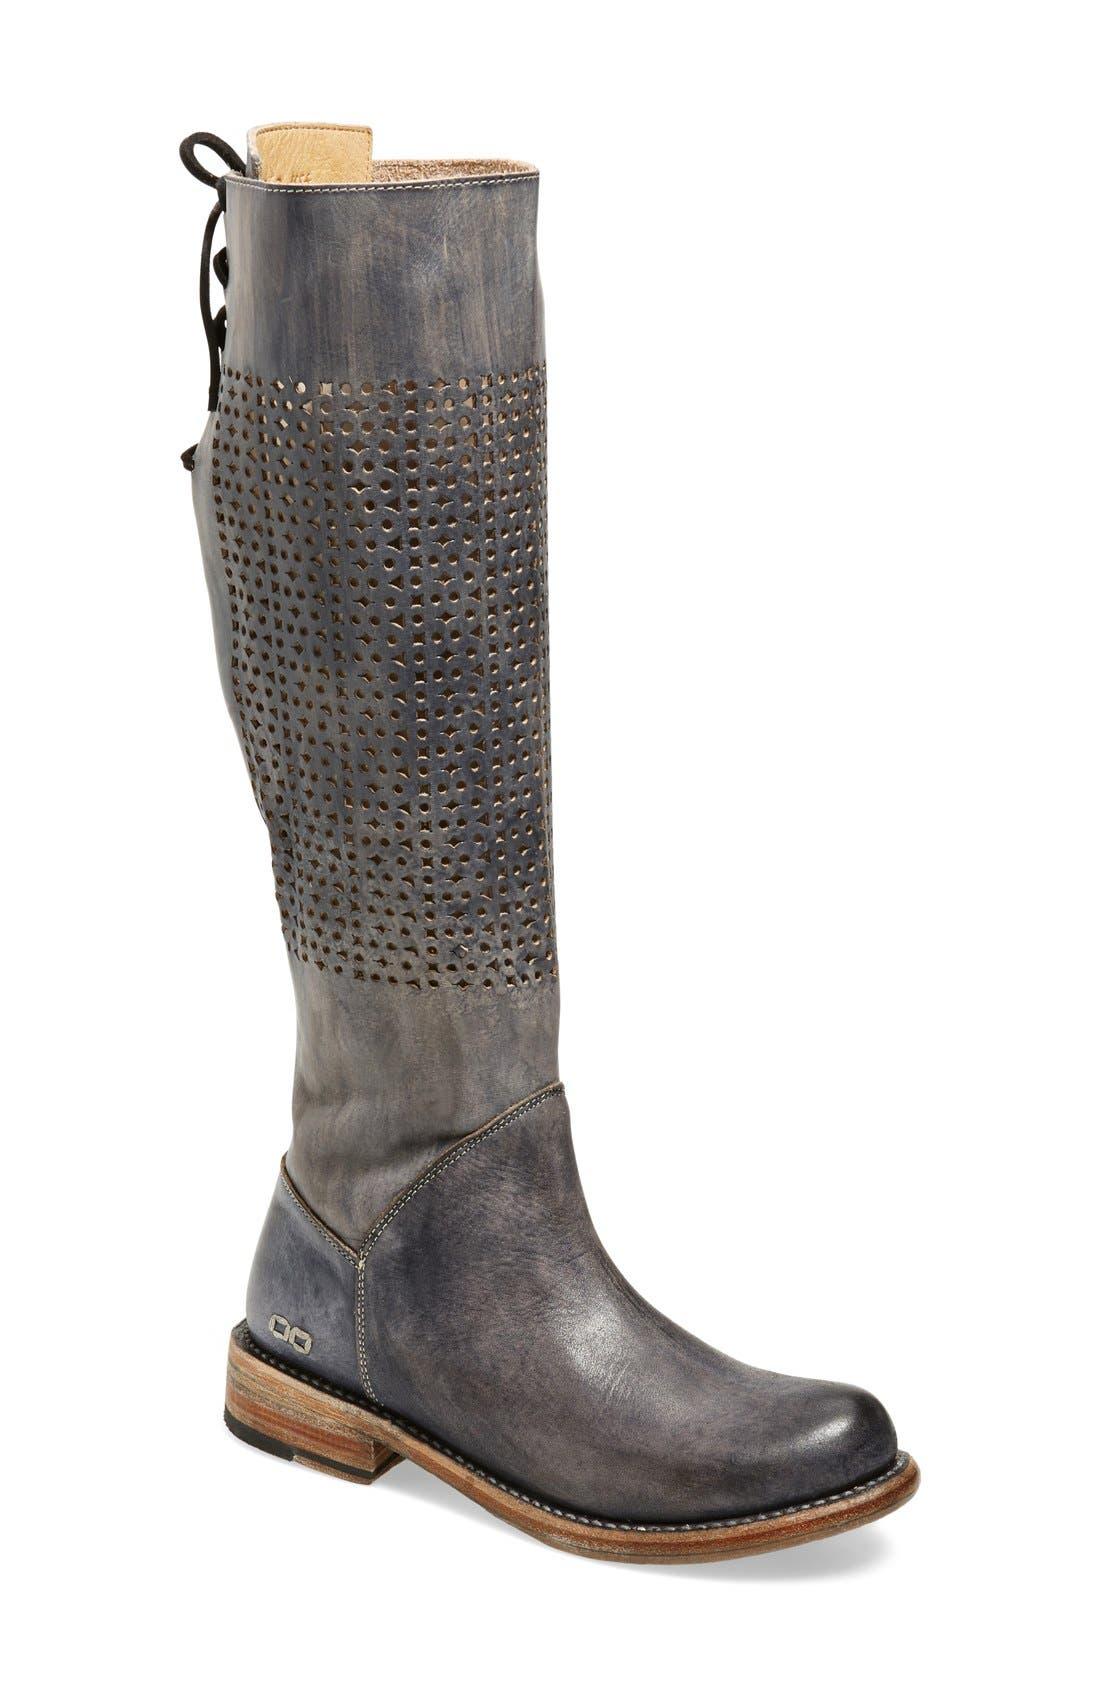 Main Image - Bed Stu 'Cambridge' Knee High Leather Boot (Women)